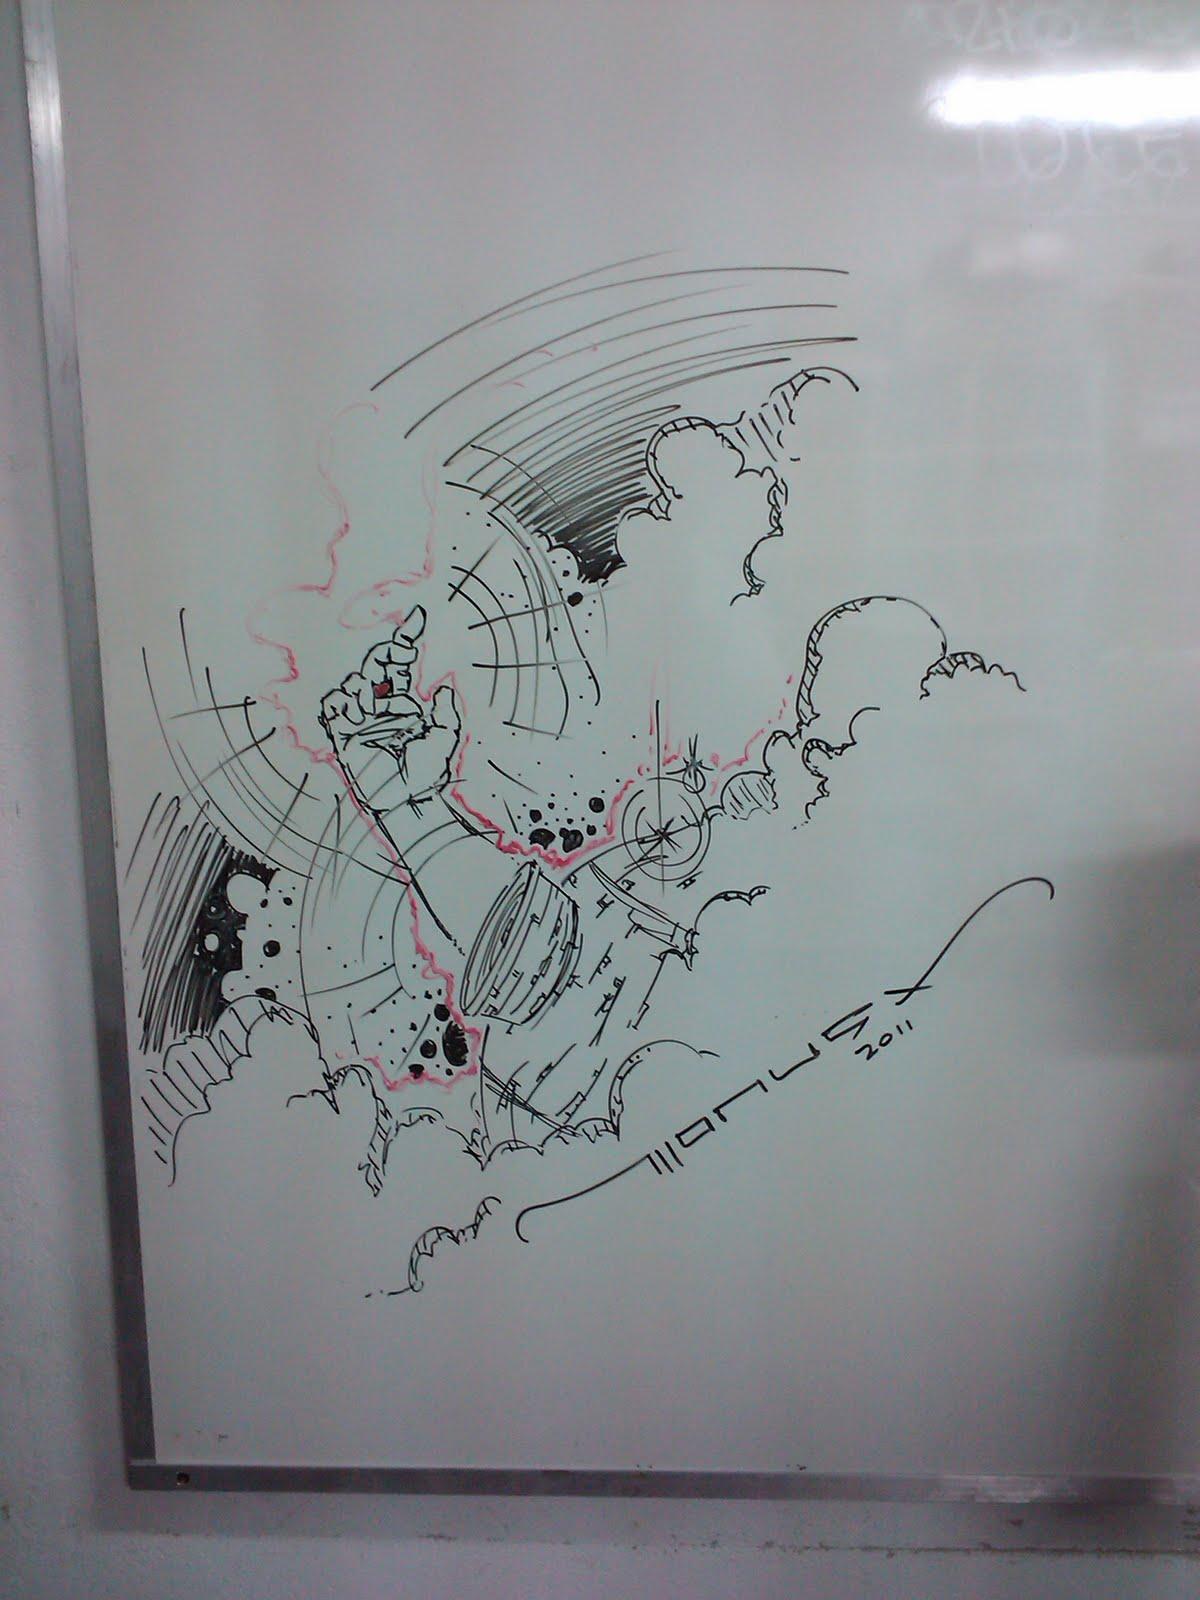 Dibujos comics e ilustraci nes pizarra blanca - Pintura de pizarra para pared ...